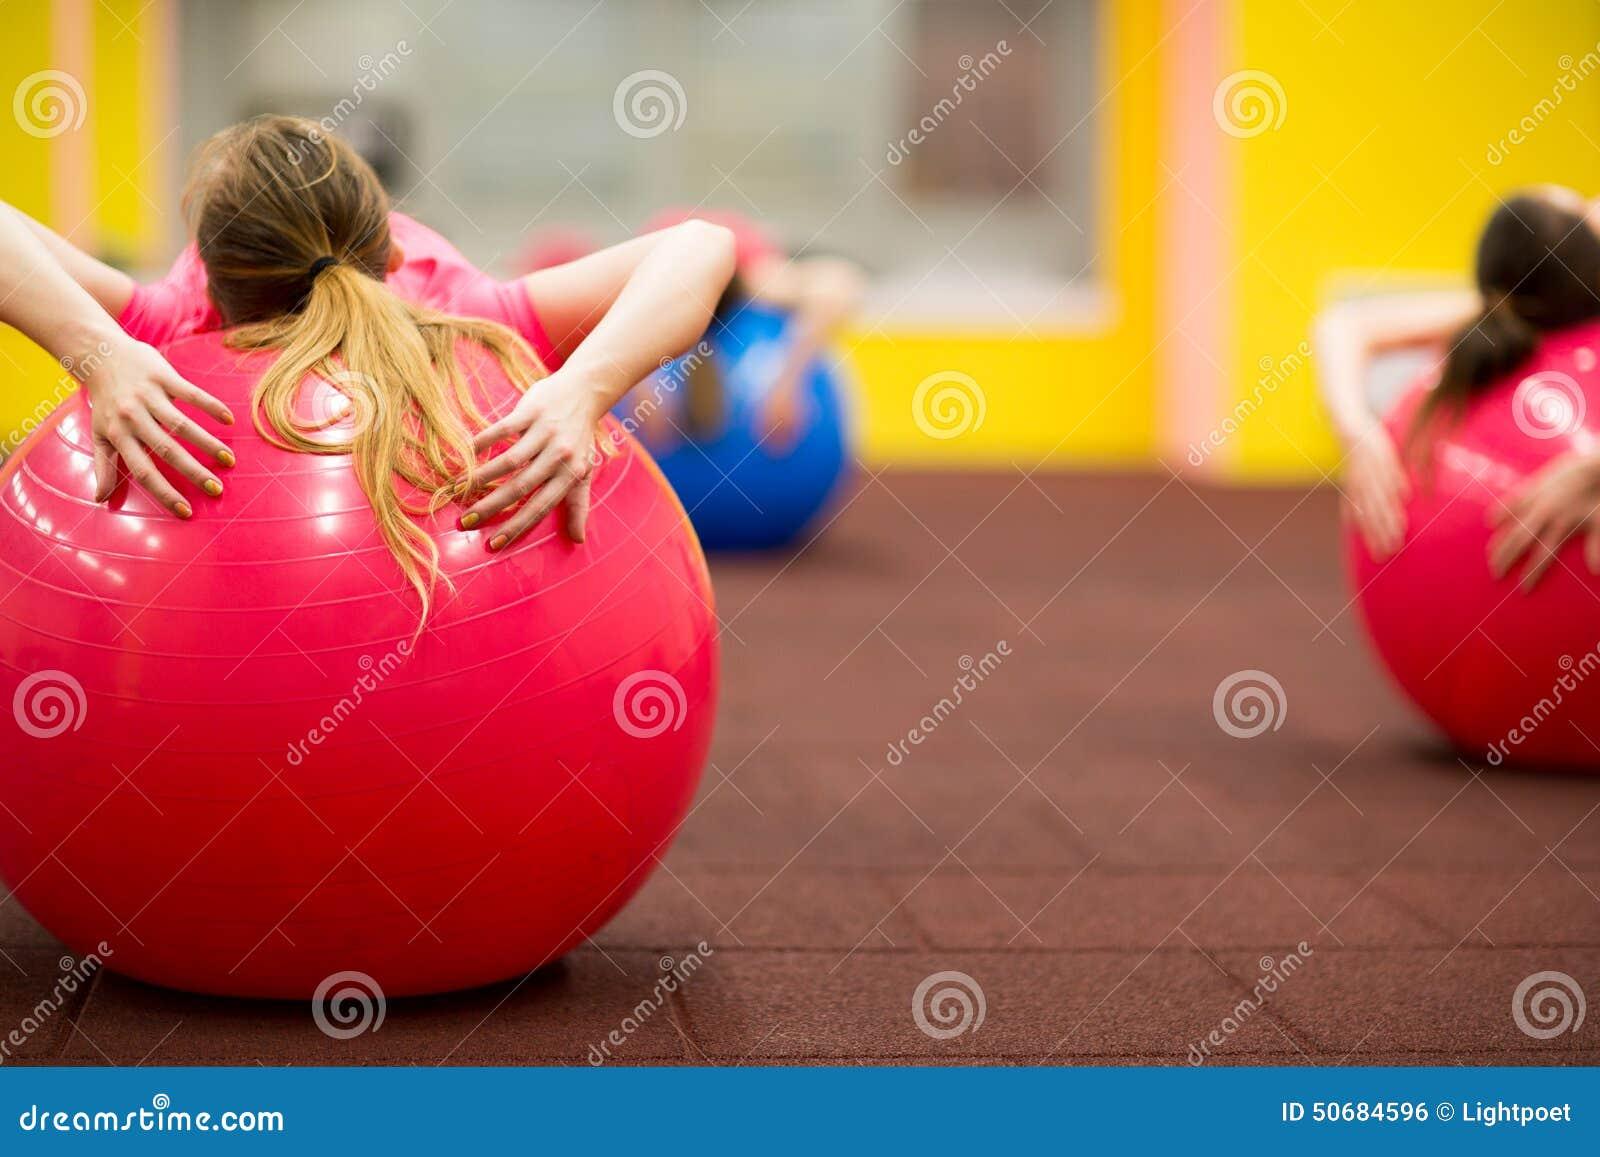 Download 编组的人pilates分类在健身房 库存照片. 图片 包括有 女性, 女孩, 休闲, 运动, 幸福, 执行 - 50684596